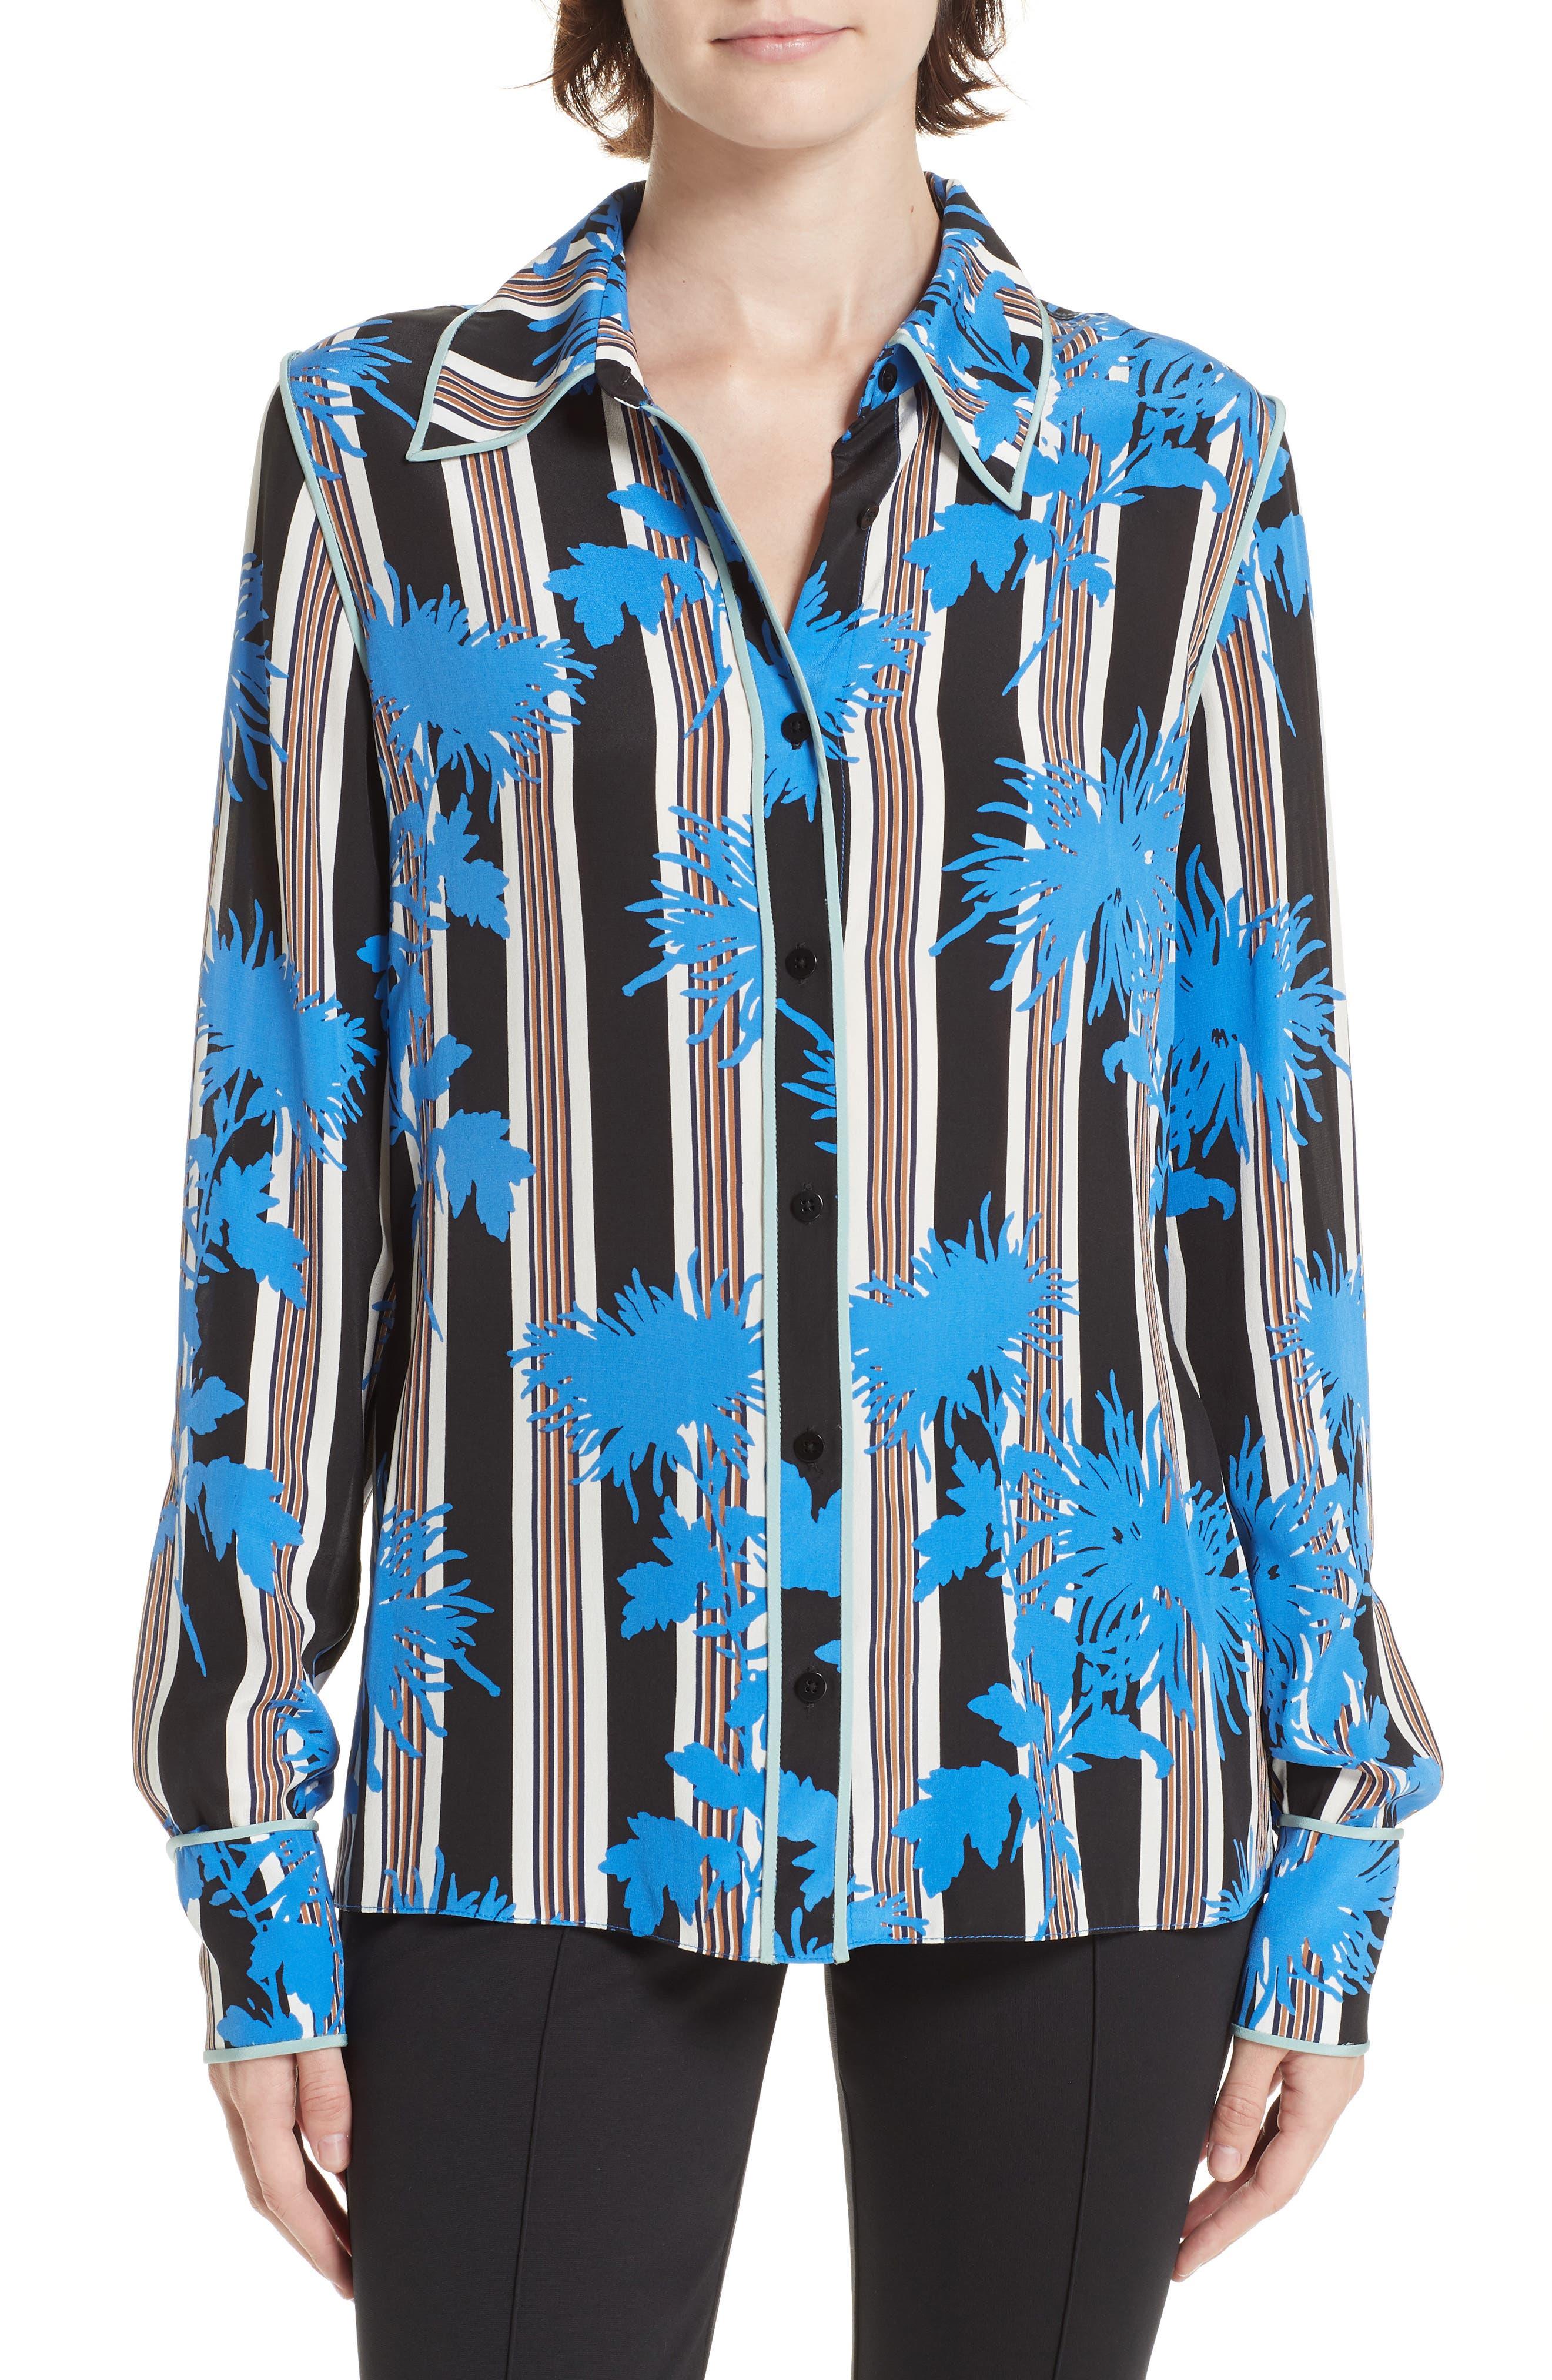 Diane von Furstenberg Floral Print Silk Shirt,                             Main thumbnail 1, color,                             SHELFORD B